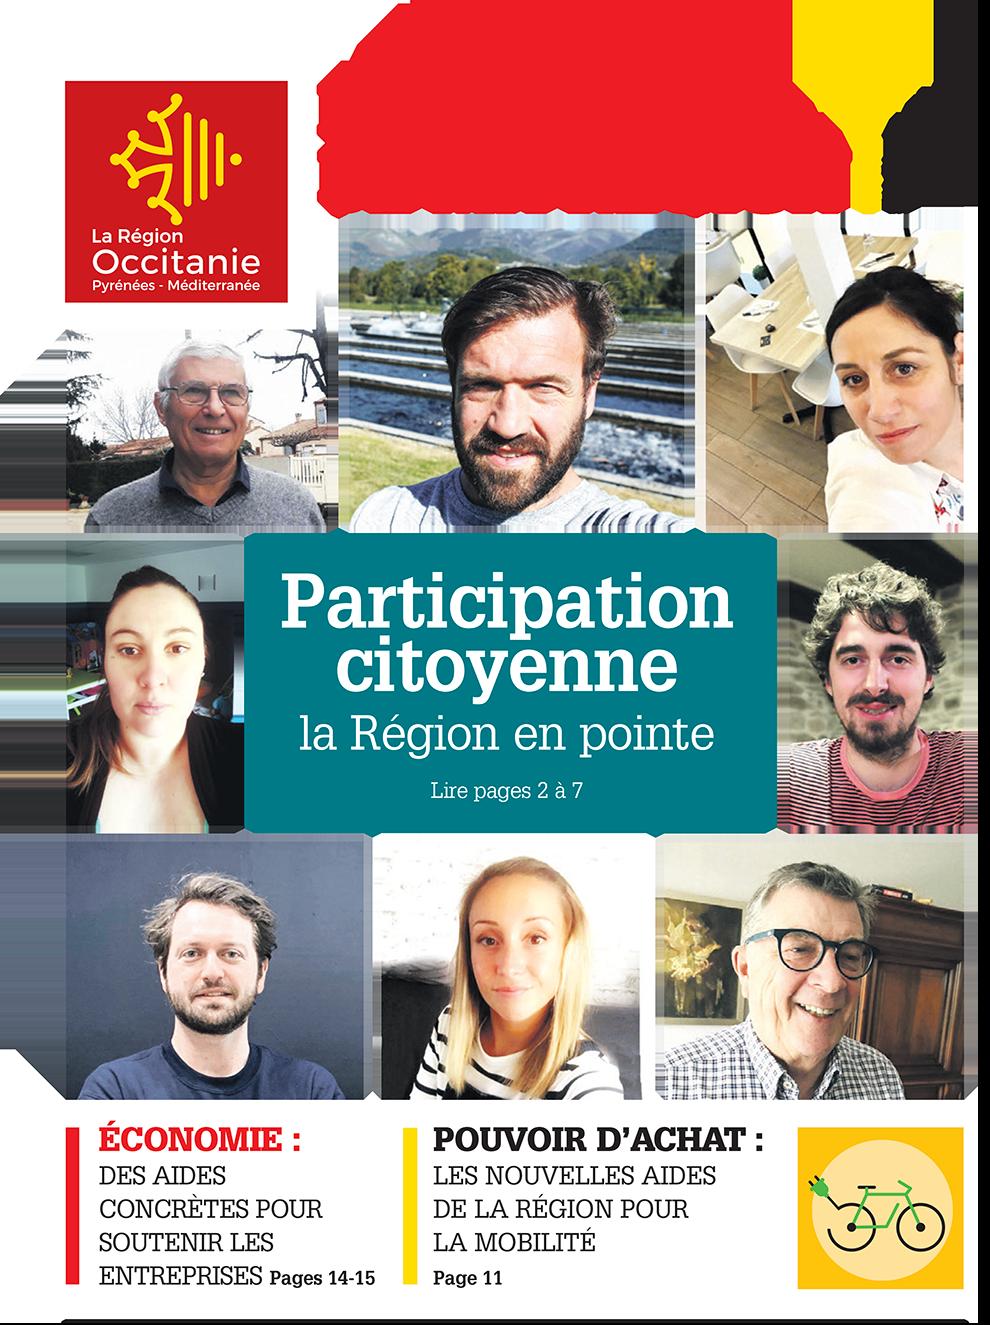 https://www.laregion.fr/IMG/png/cr_17_-_mars_2019-46_batweb-1-14.png